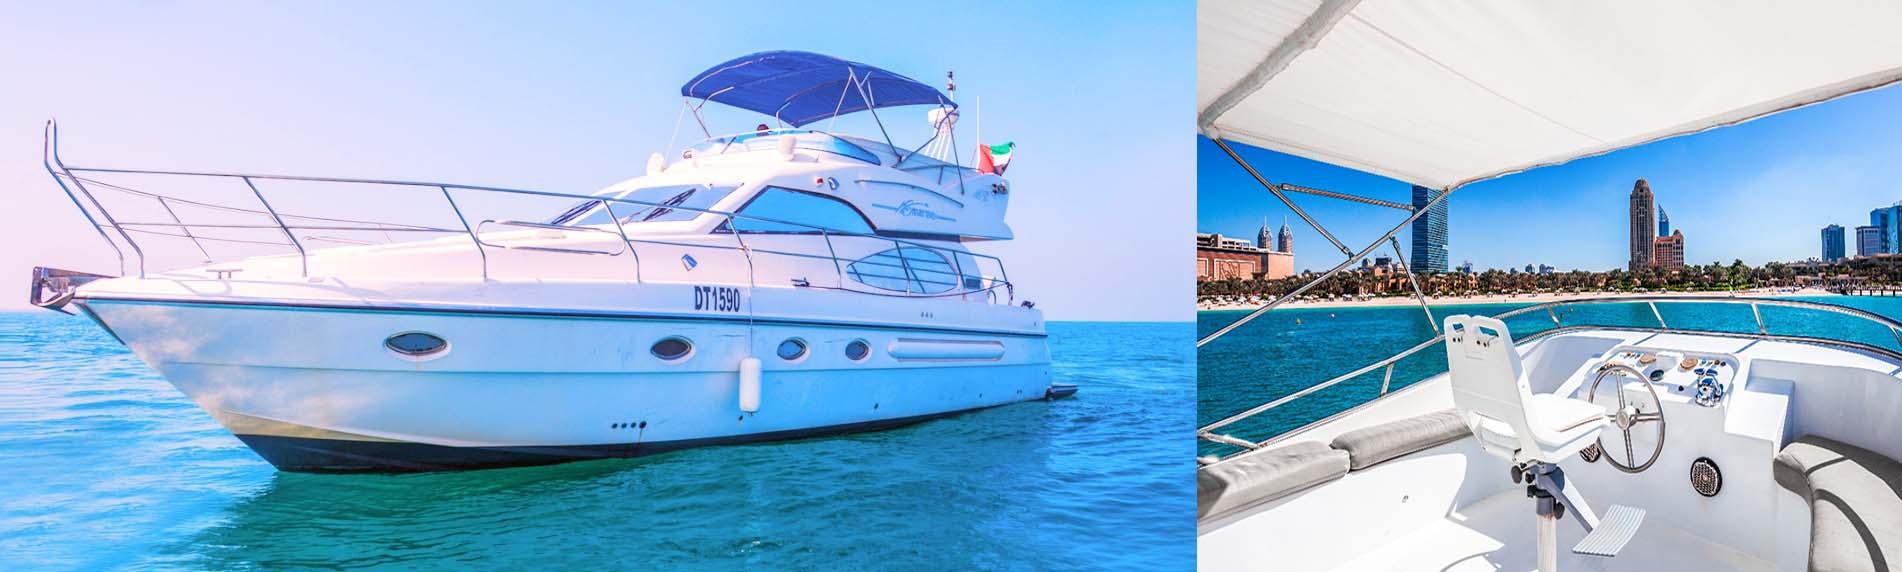 yacht 55ft